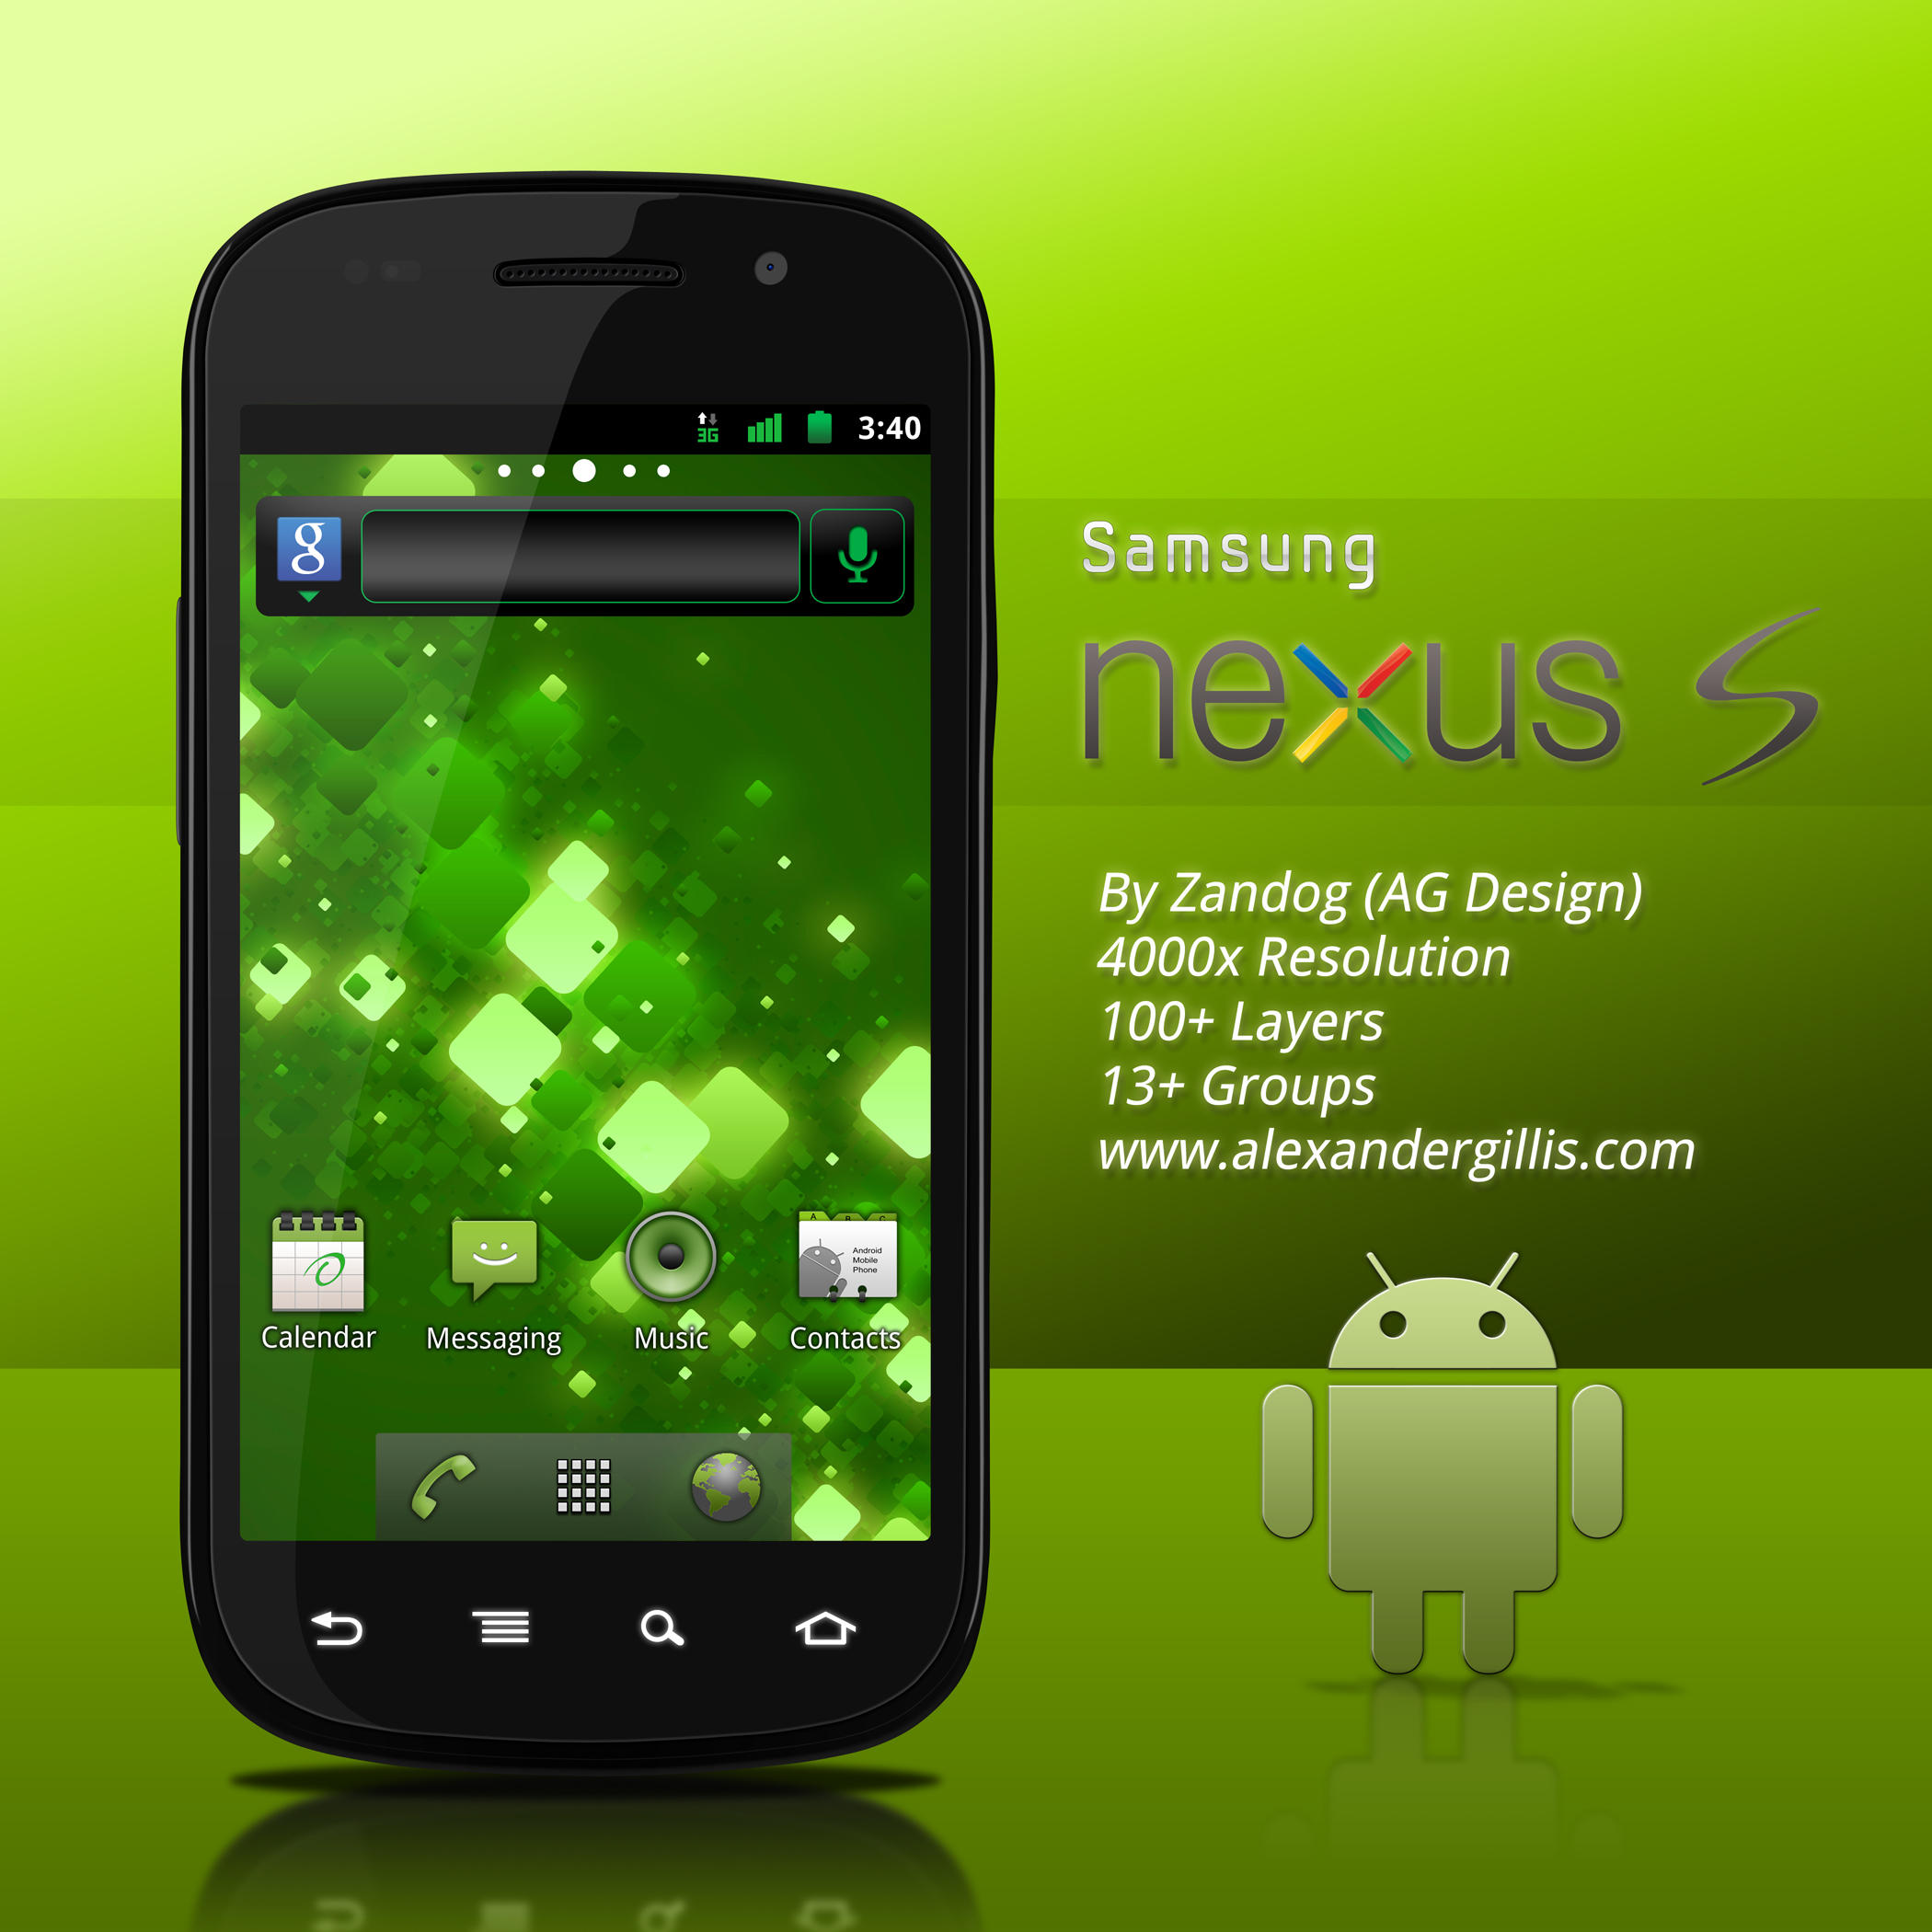 Samsung Nexus S .PSD by zandog